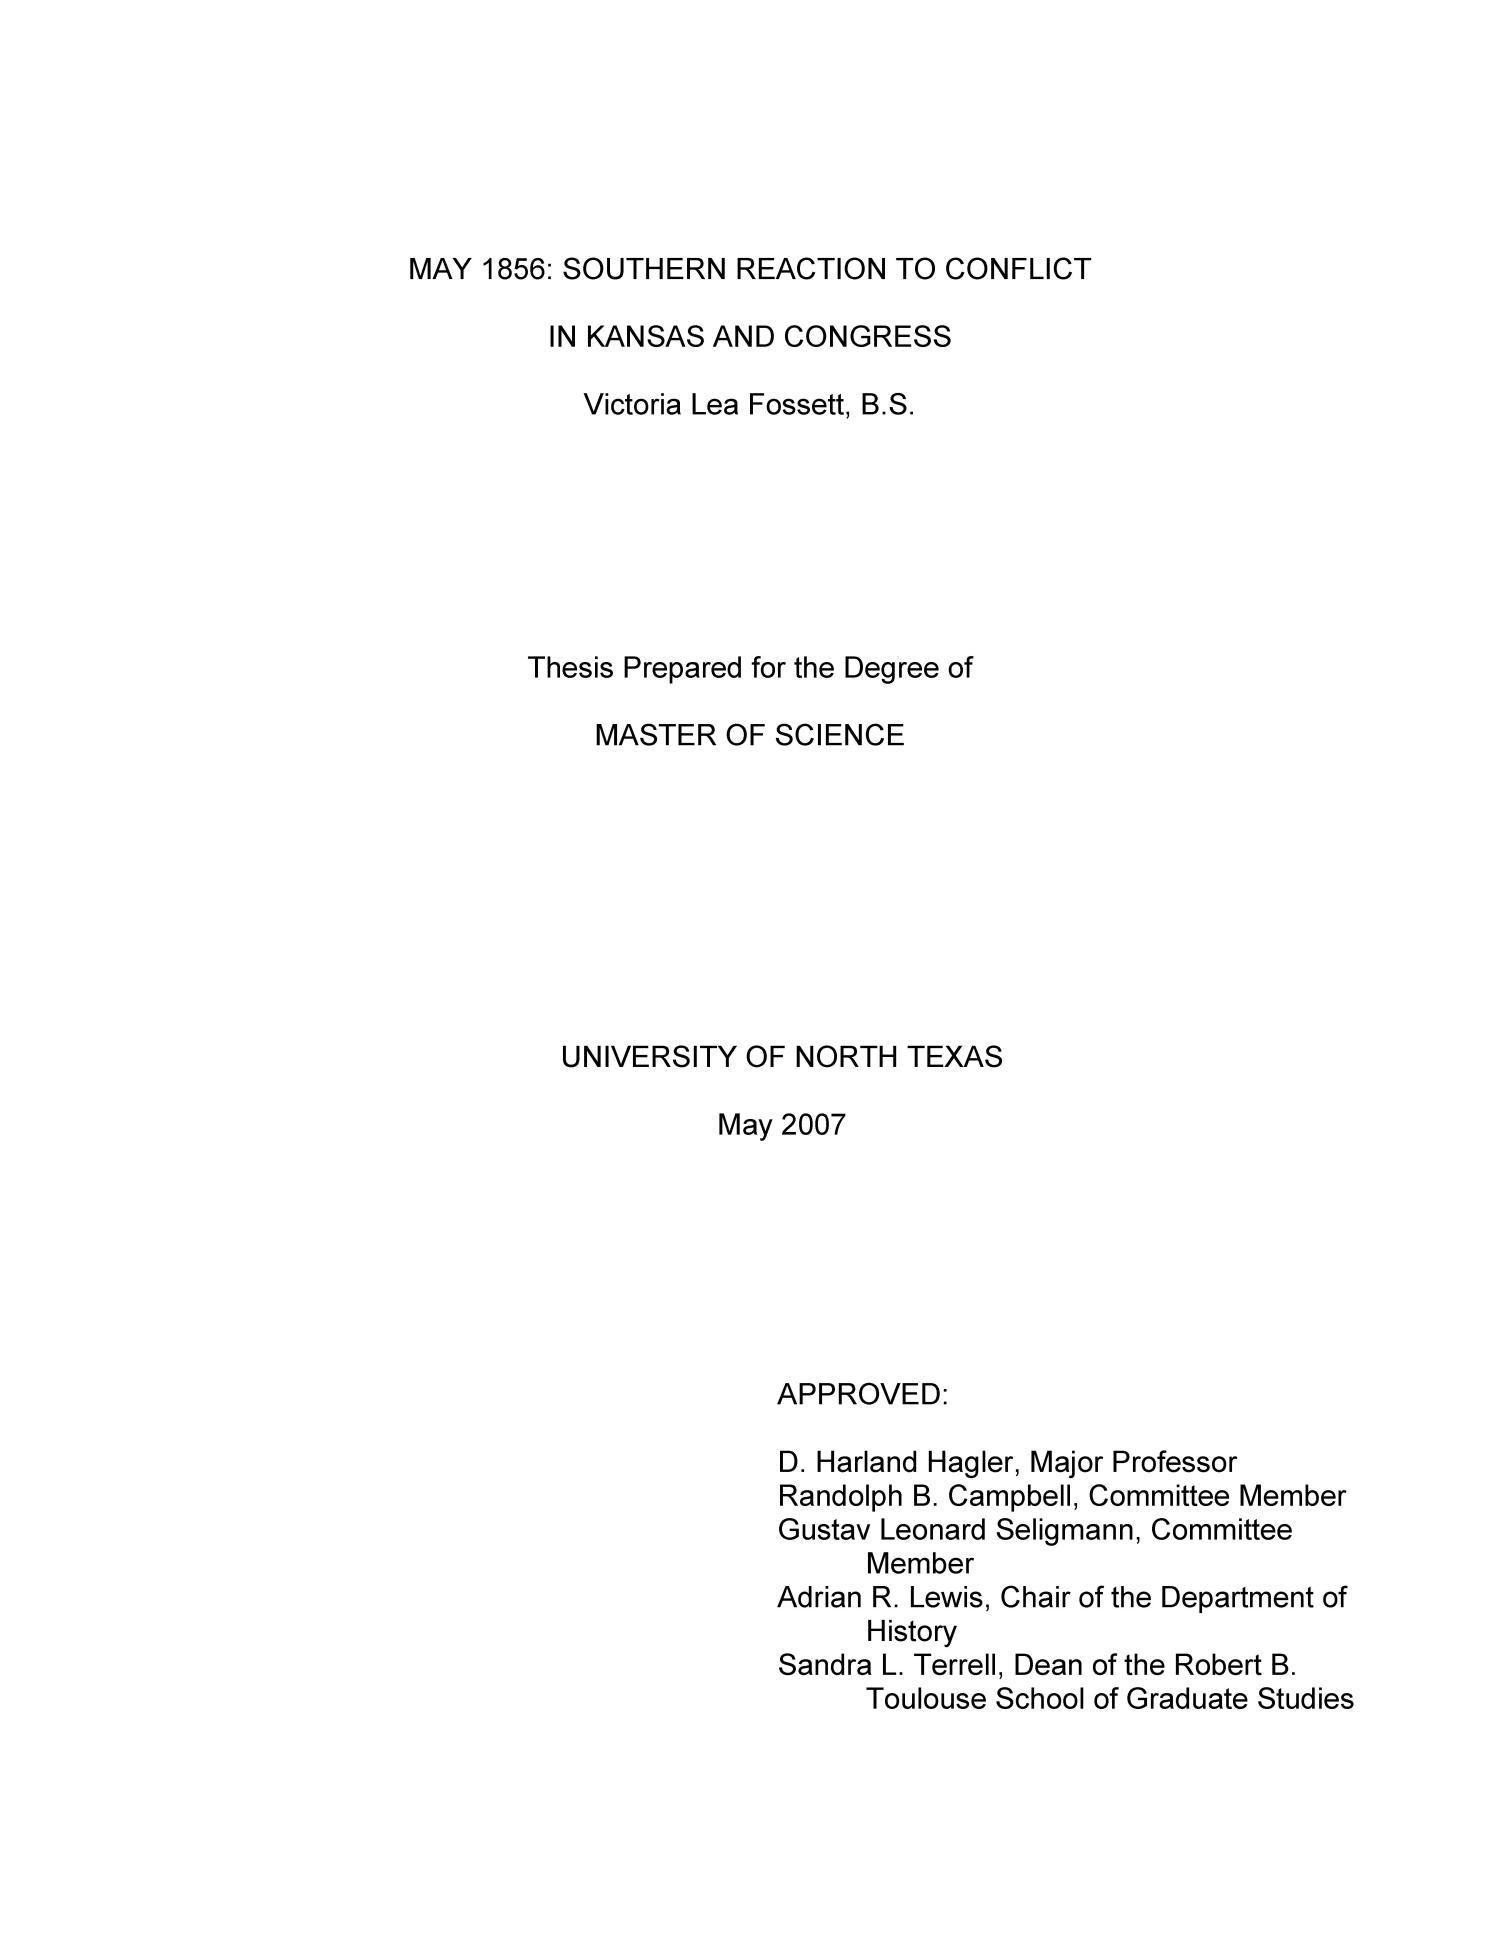 Masters thesis university of kansas